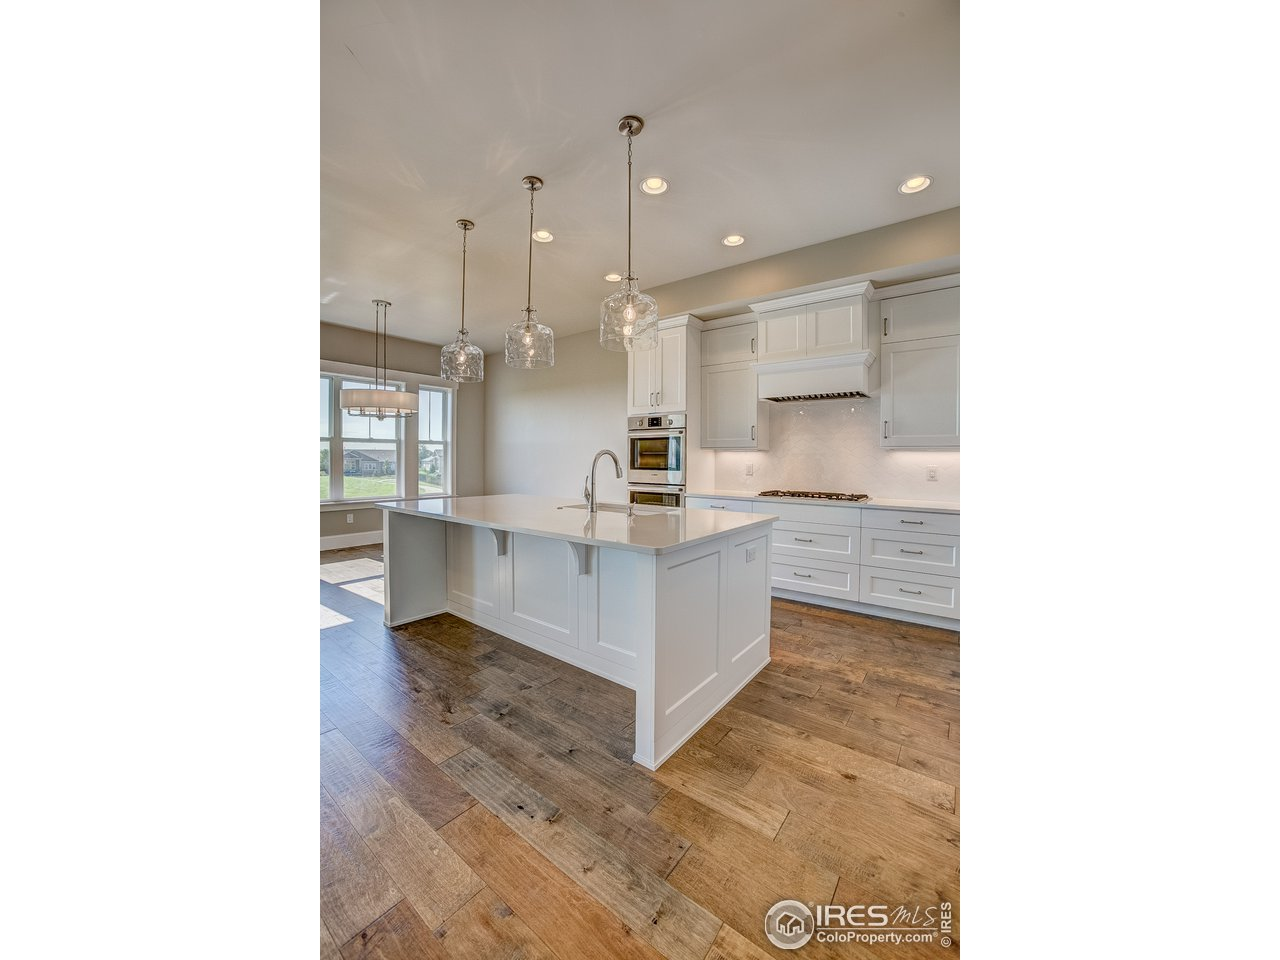 10' kitchen island w/ quartz countertop